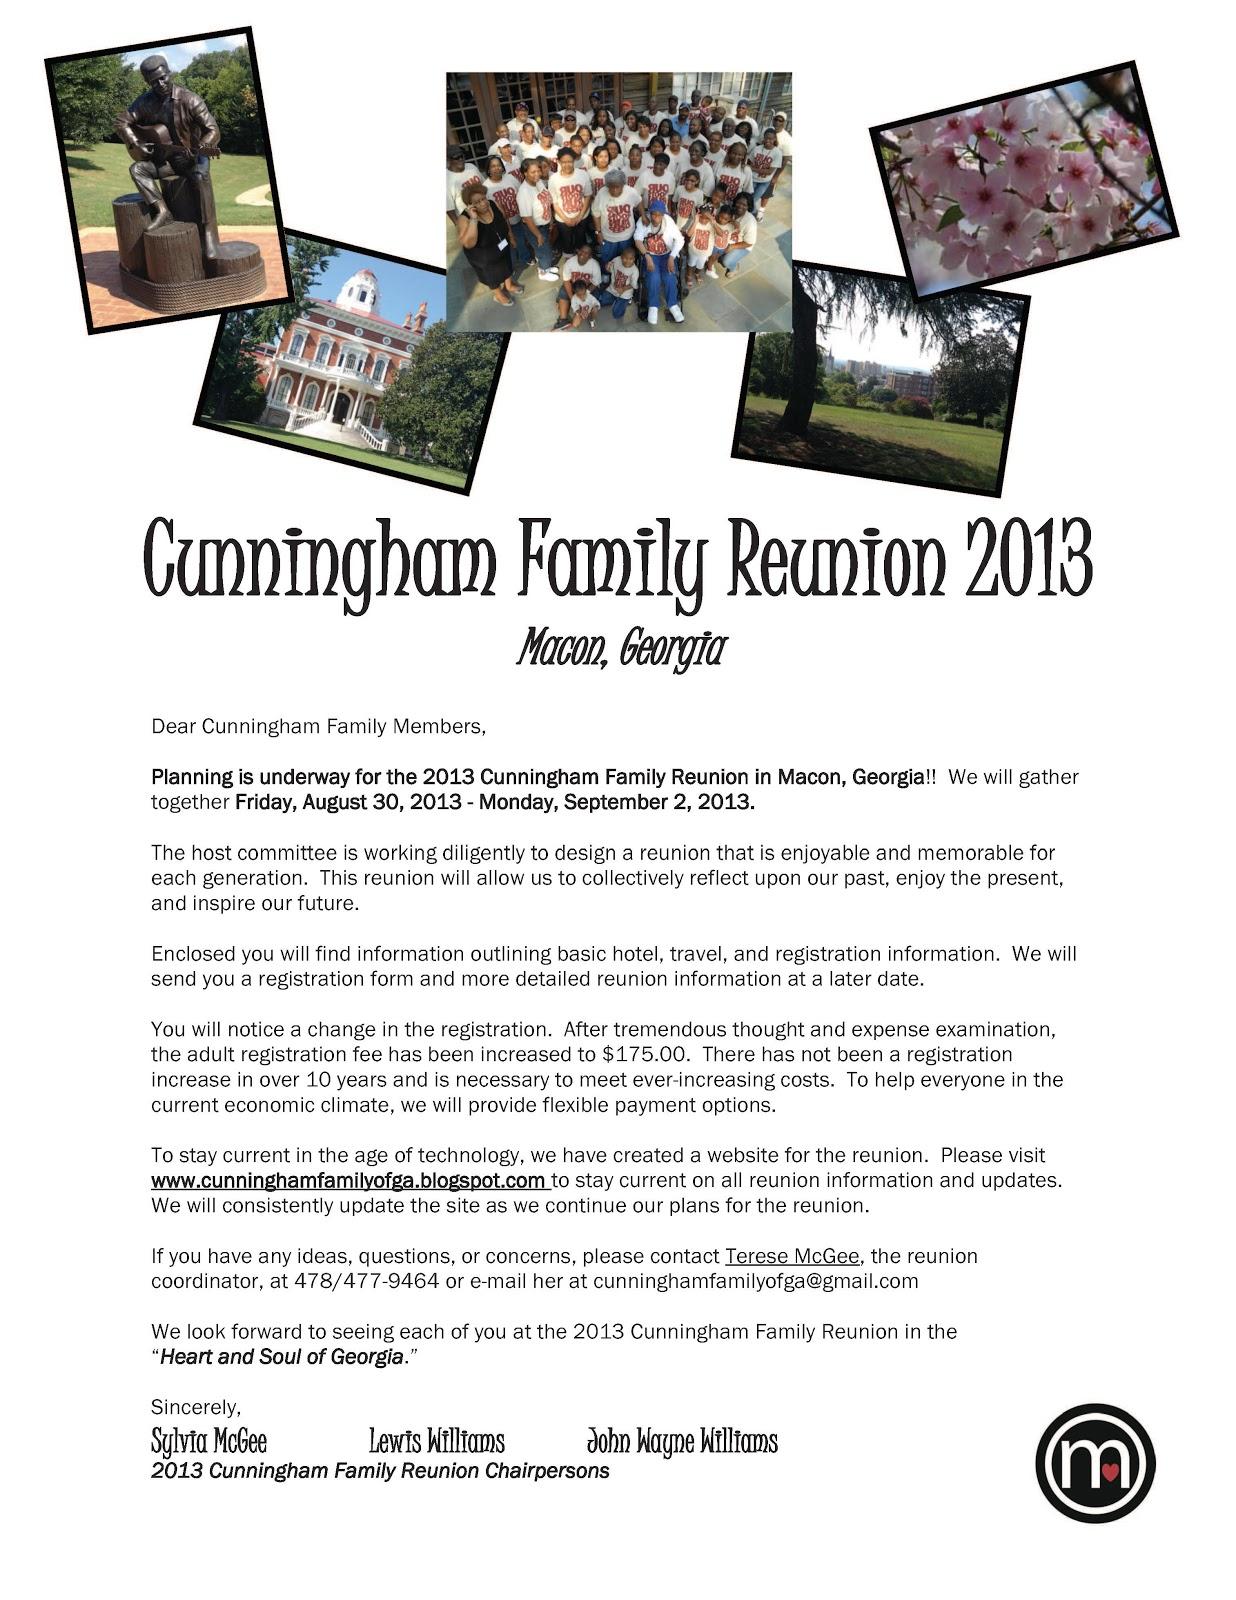 Cunningham Family Reunion 2013: Family Reunion Information ...